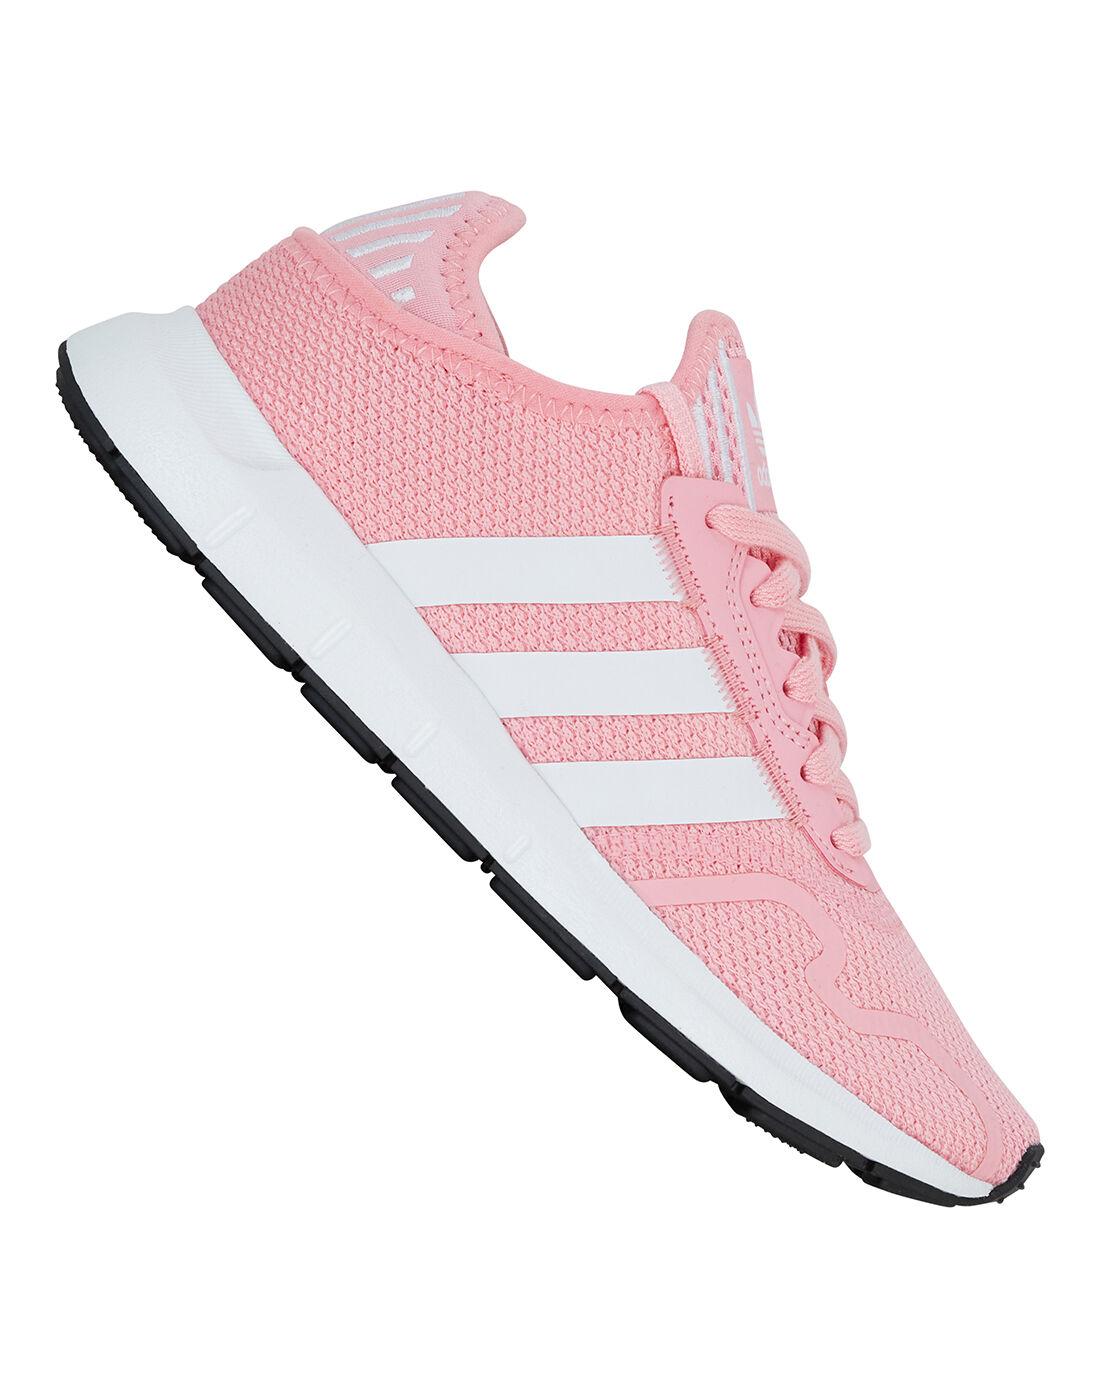 adidas Originals nike air grey white leather stripes background   Older Girls Swift Run